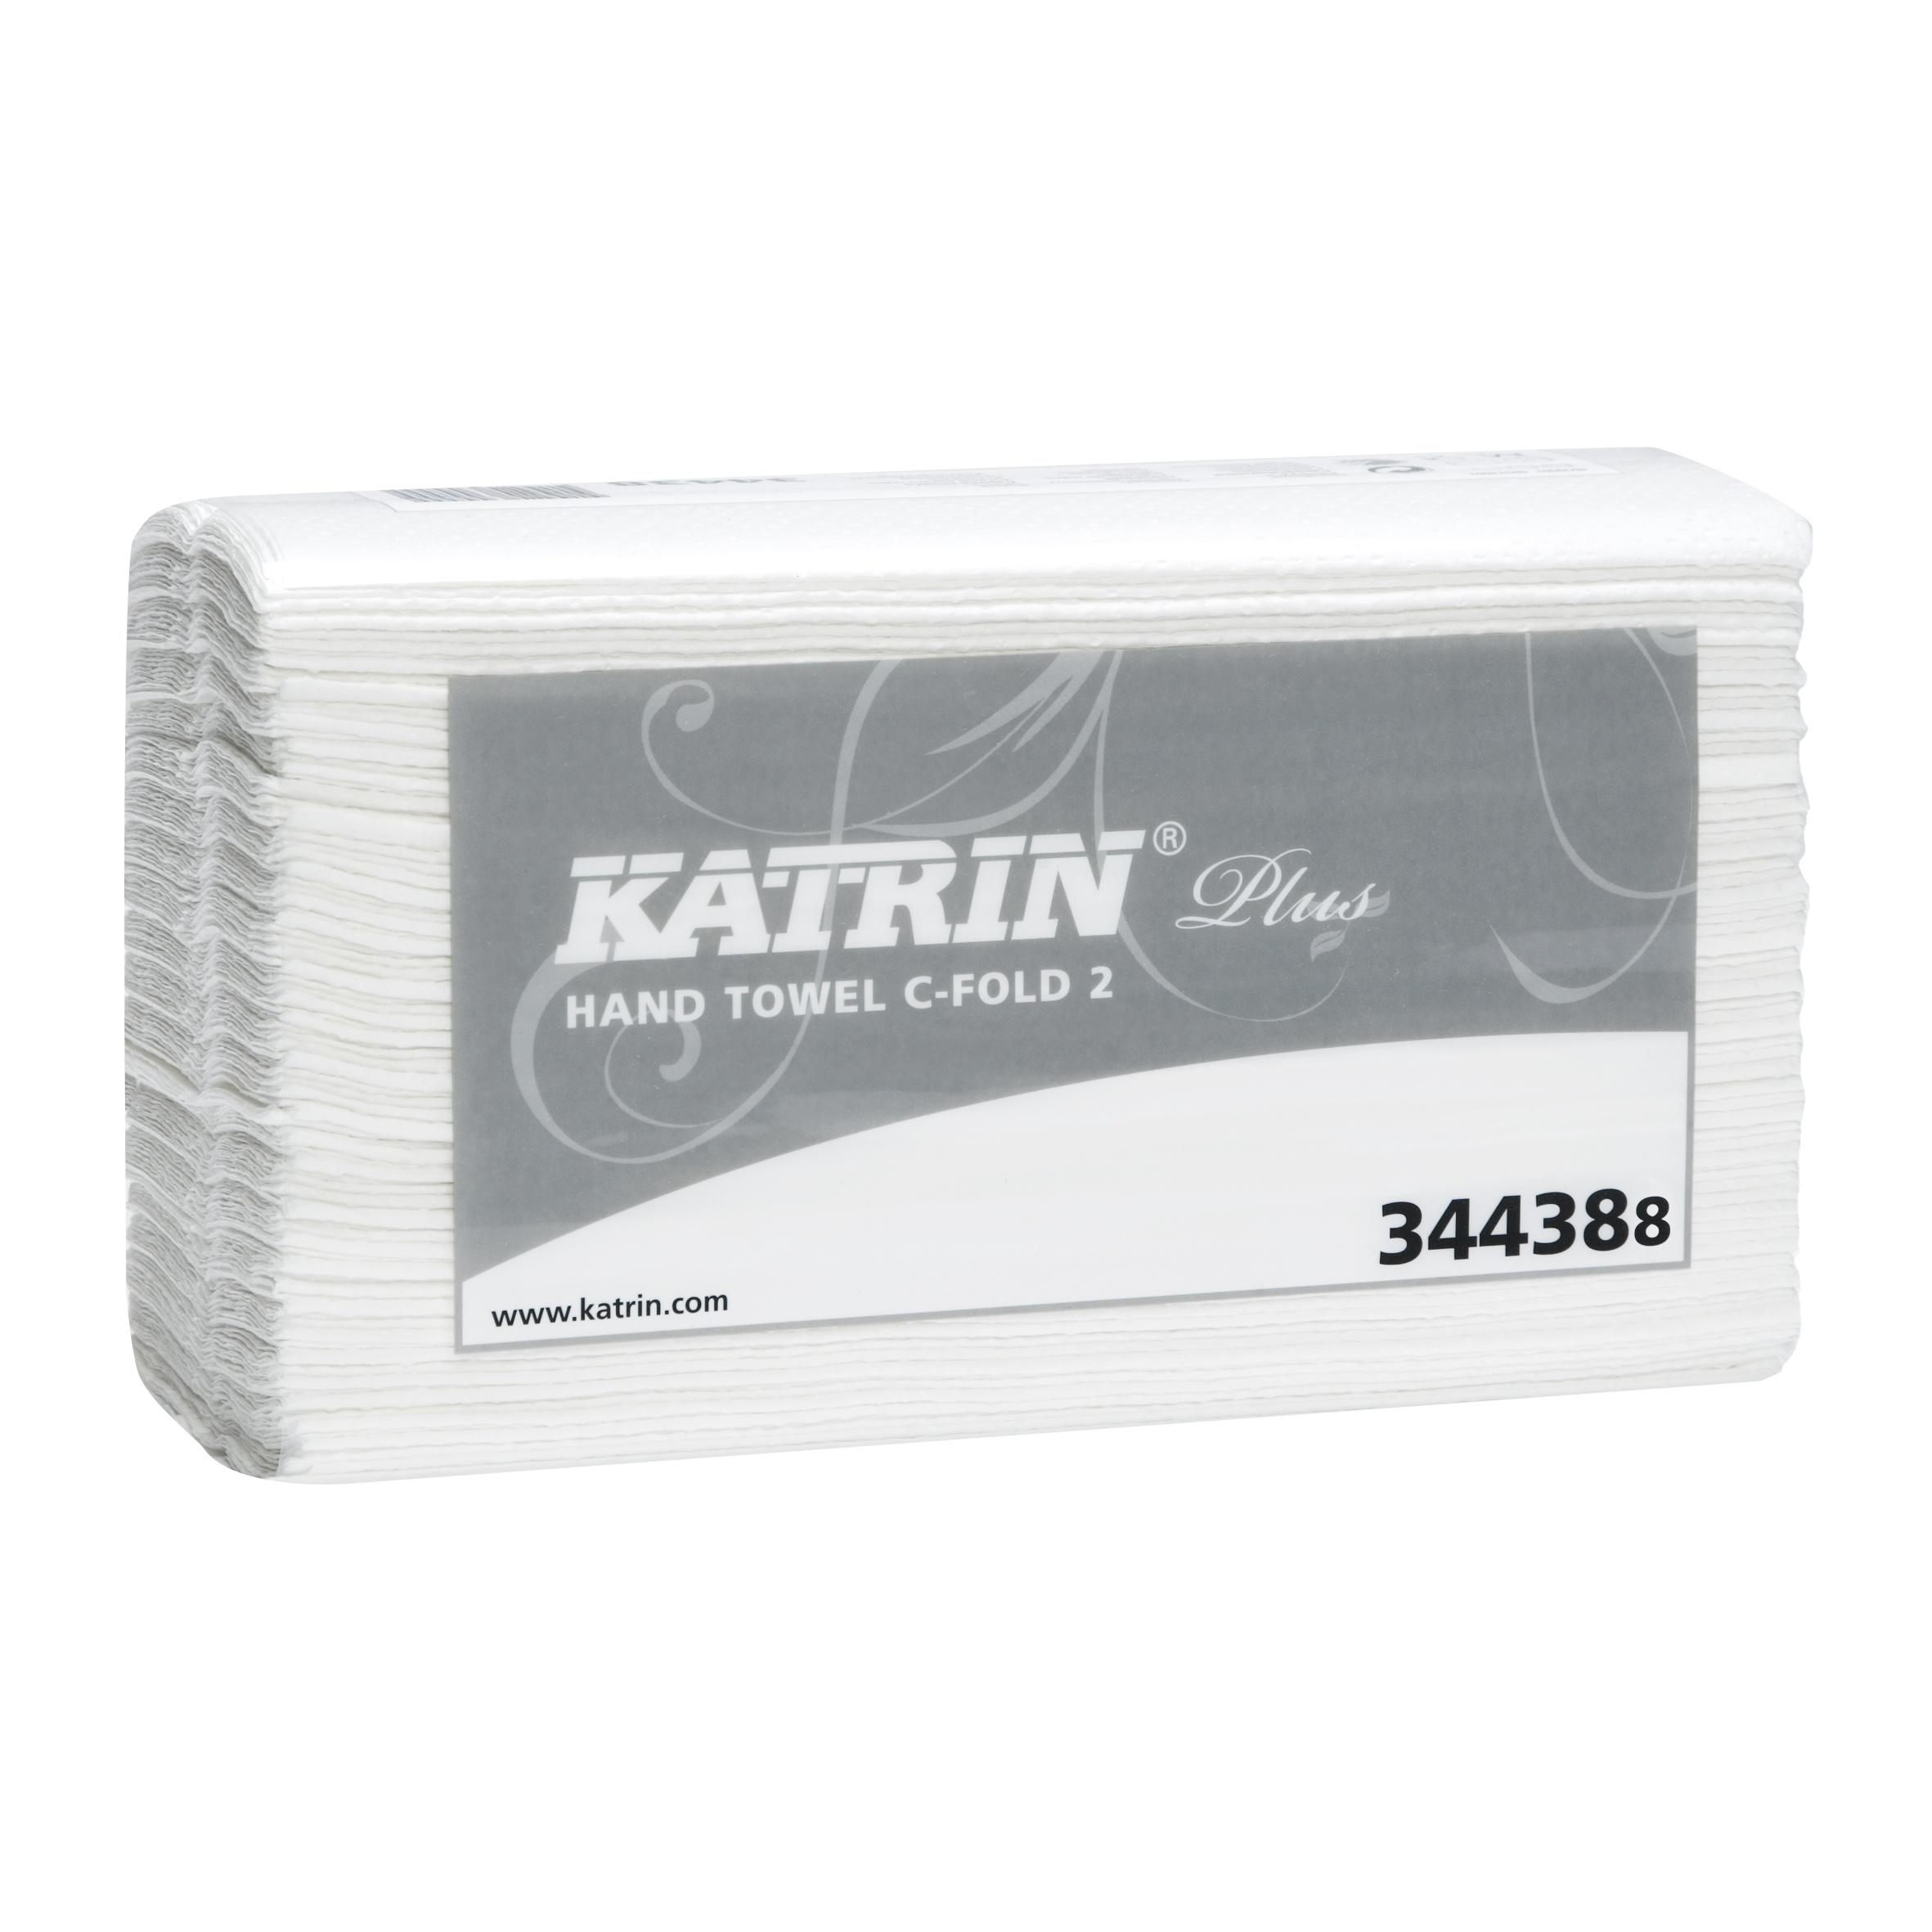 Katrin PLUS Hand Towel C-Fold 2   344302